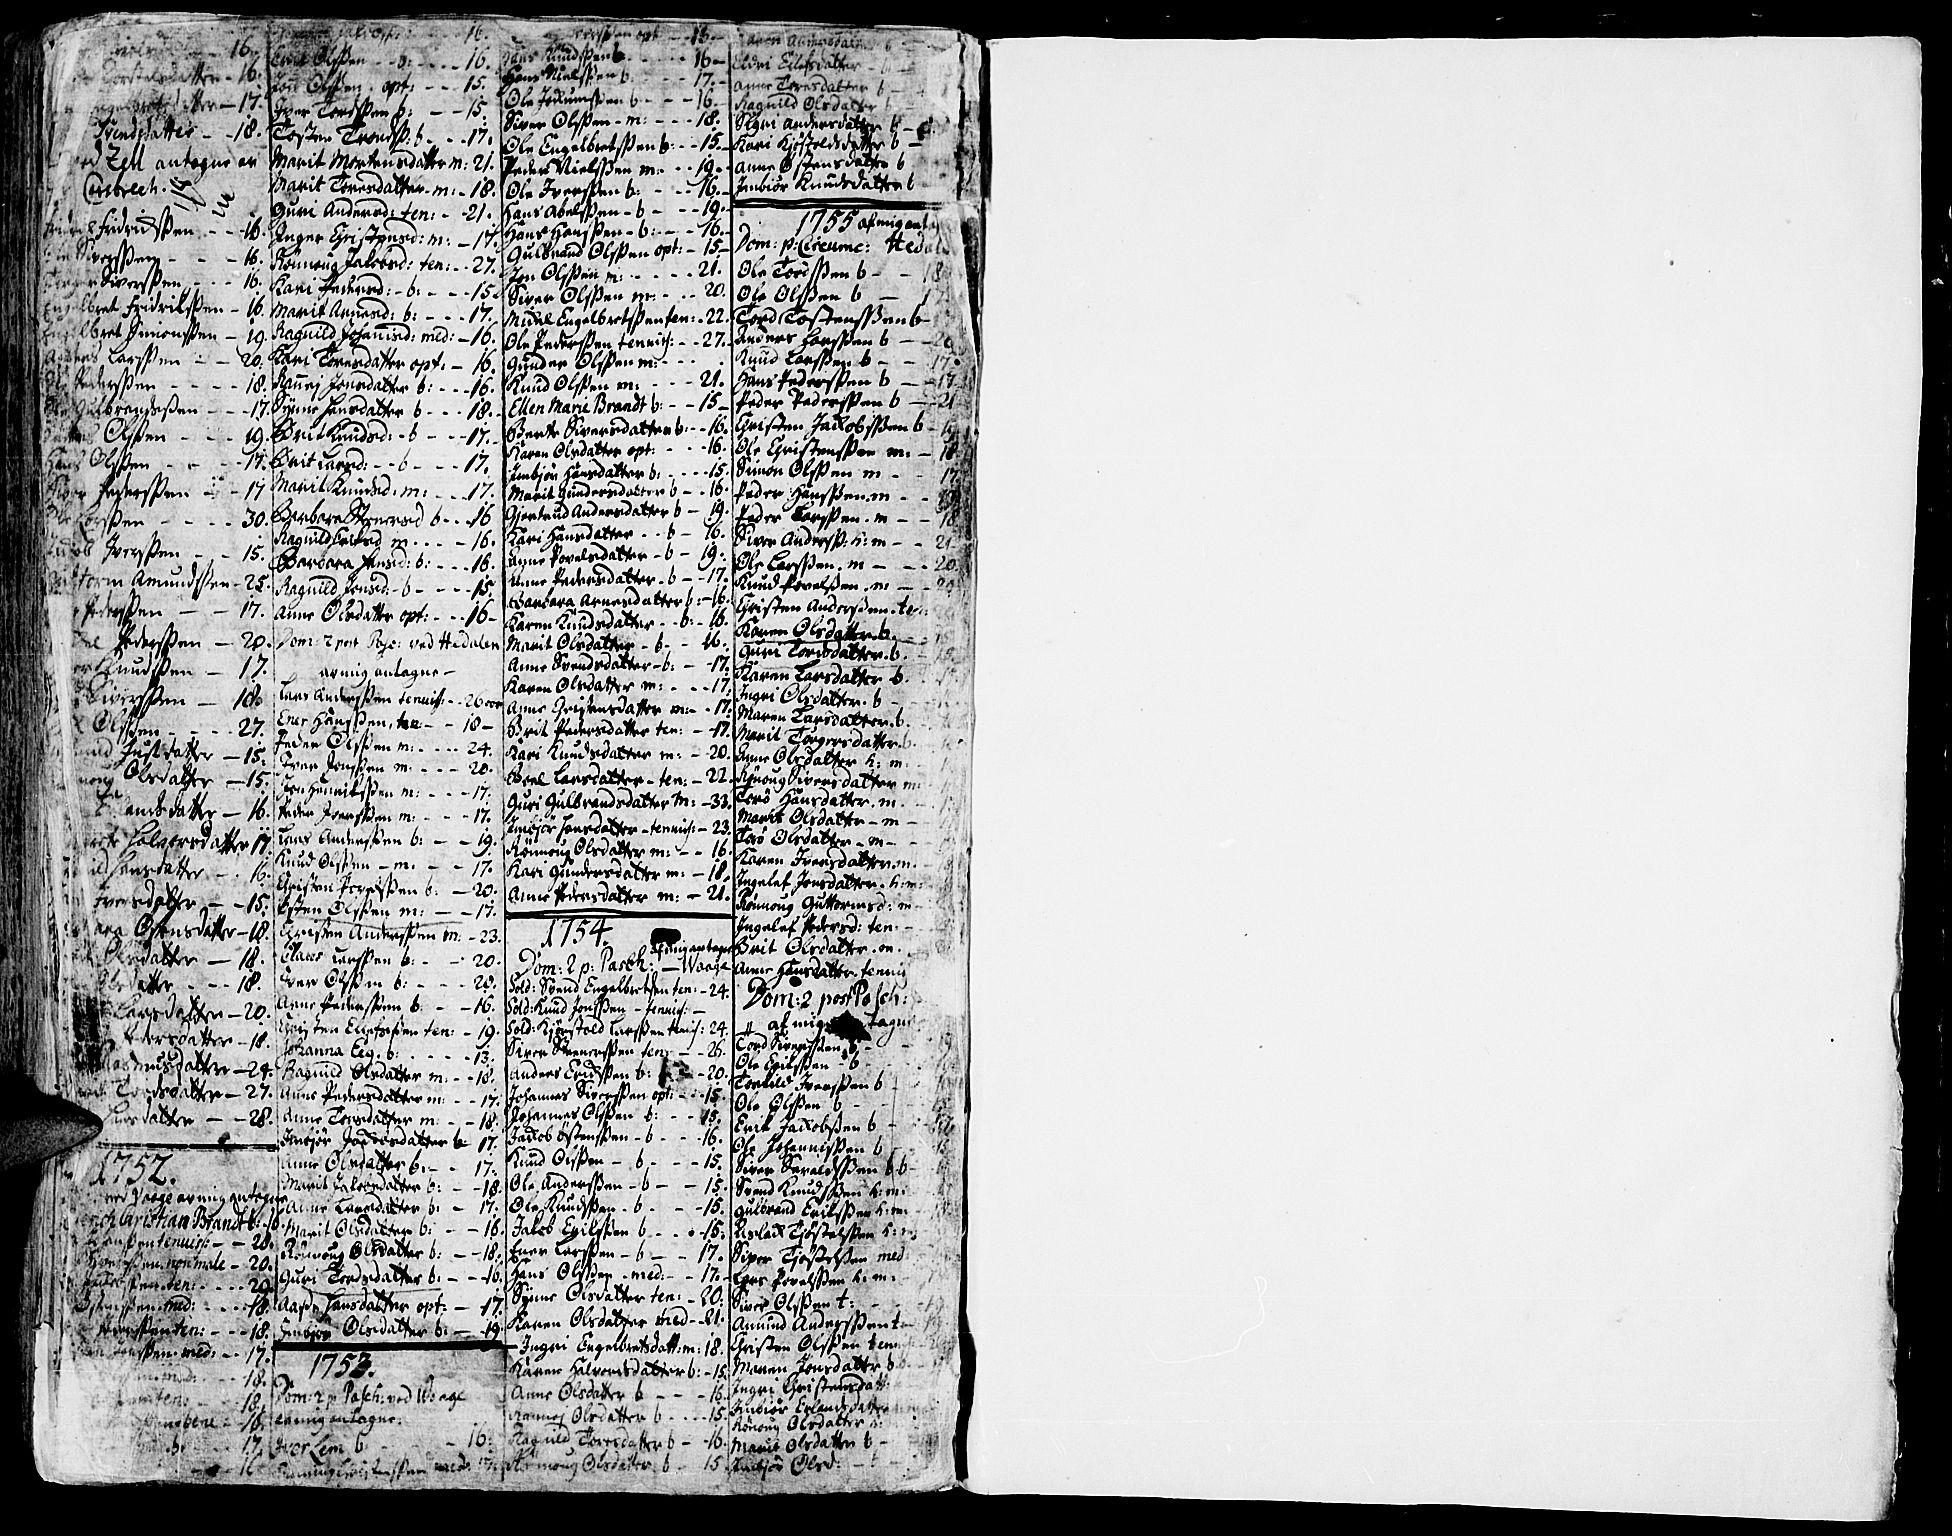 SAH, Vågå prestekontor, Ministerialbok nr. 1, 1739-1810, s. 234